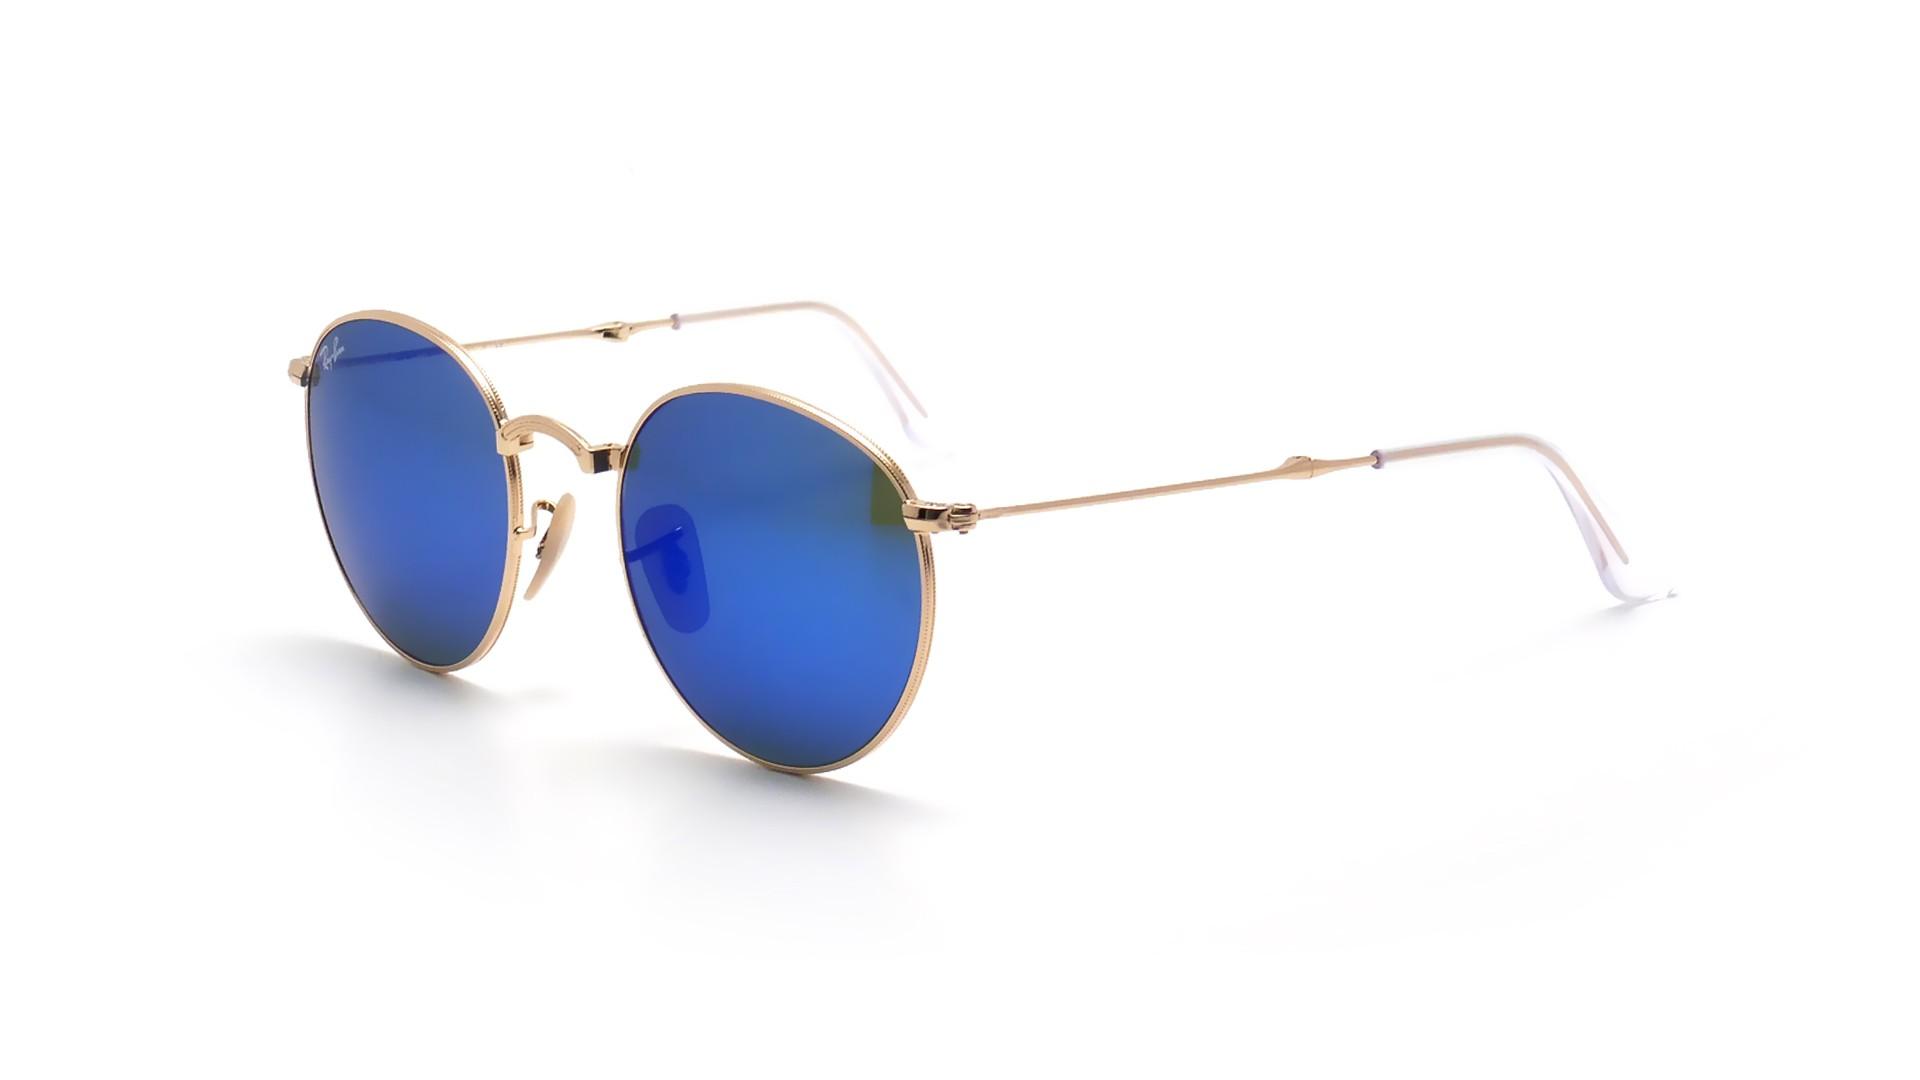 7e886b87f4 Sunglasses Ray-Ban Round Gold RB3532 001 68 50-20 Medium Pliantes Mirror